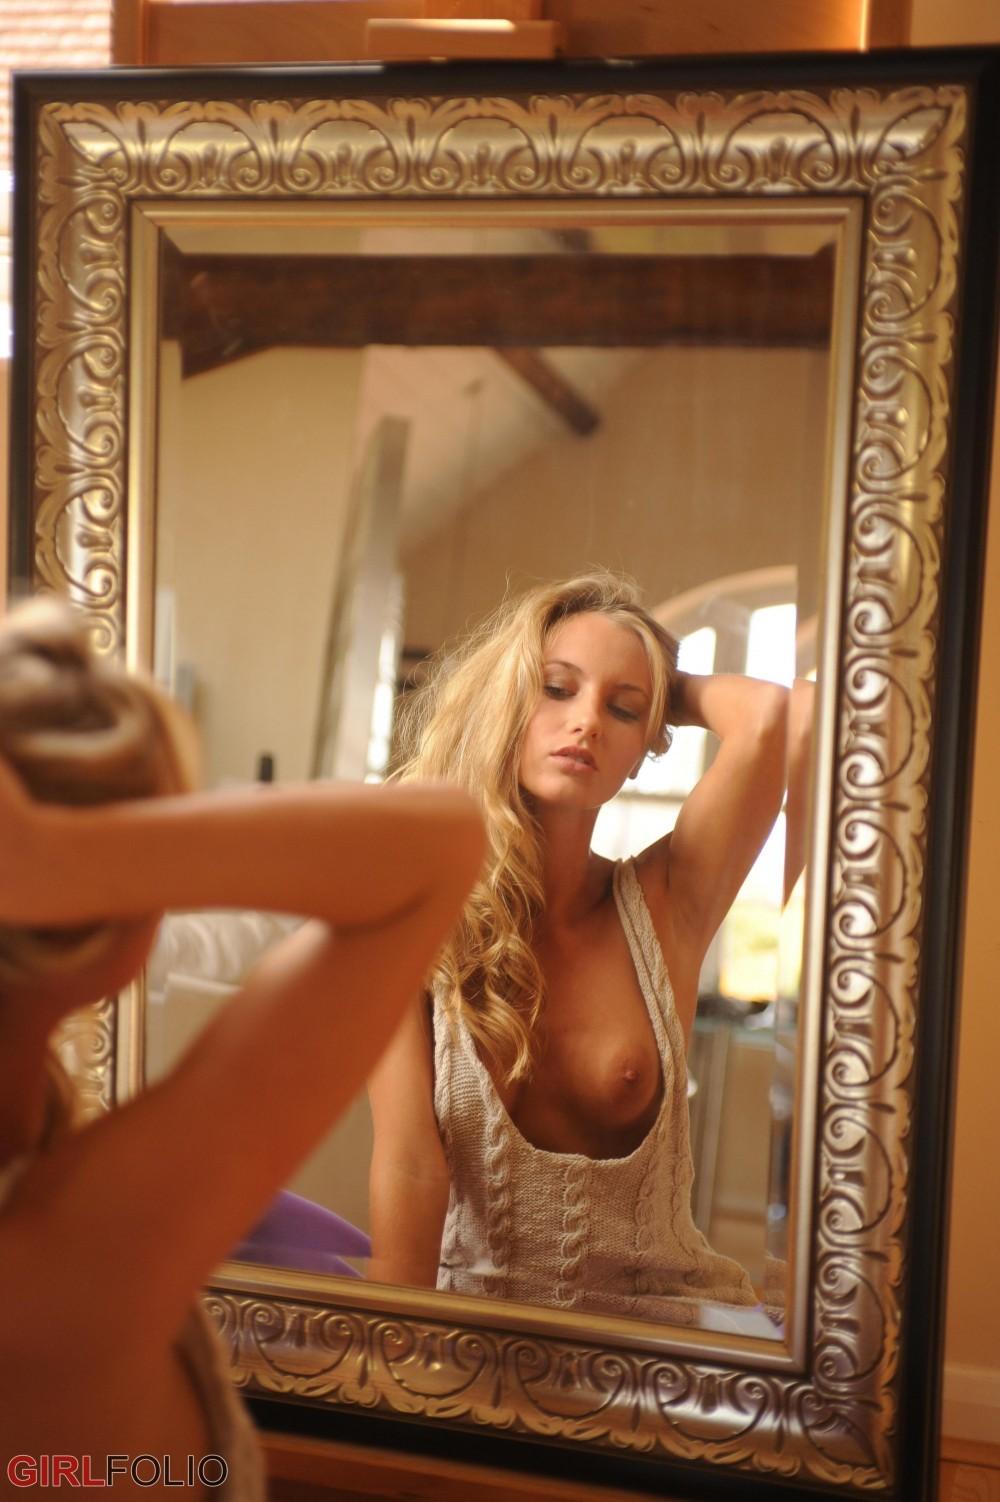 galleries girlfolio assets affiliates gallery natasha b mirror mirror medium DSC 1778